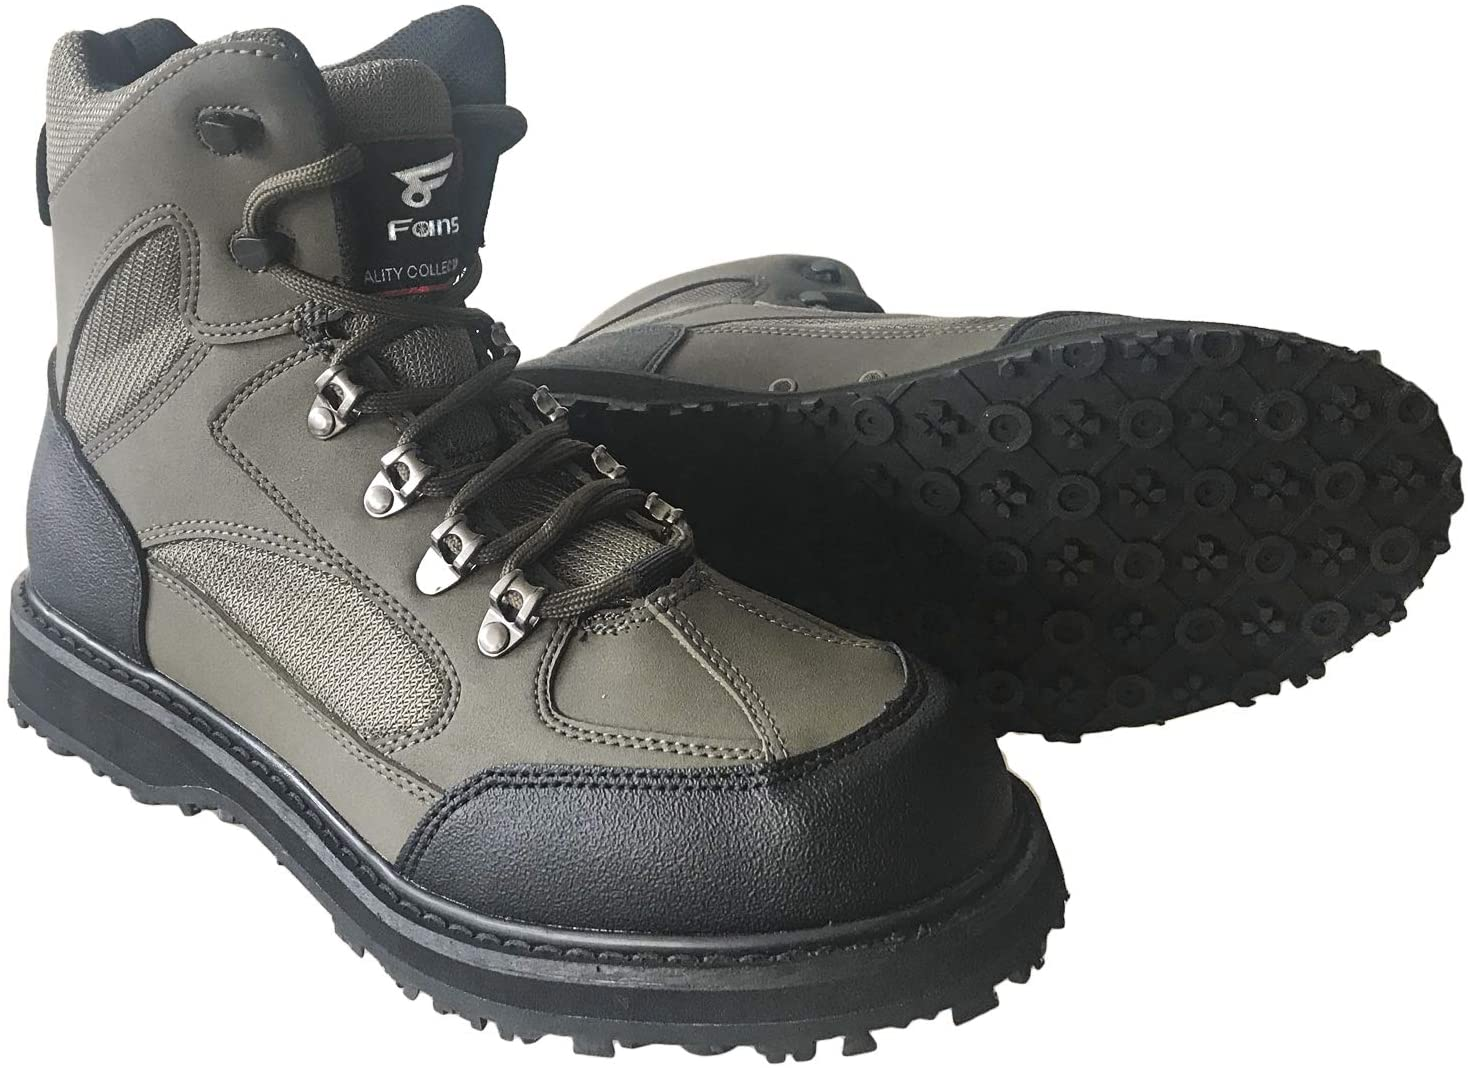 8 Fans Lightweight Wader Shoes